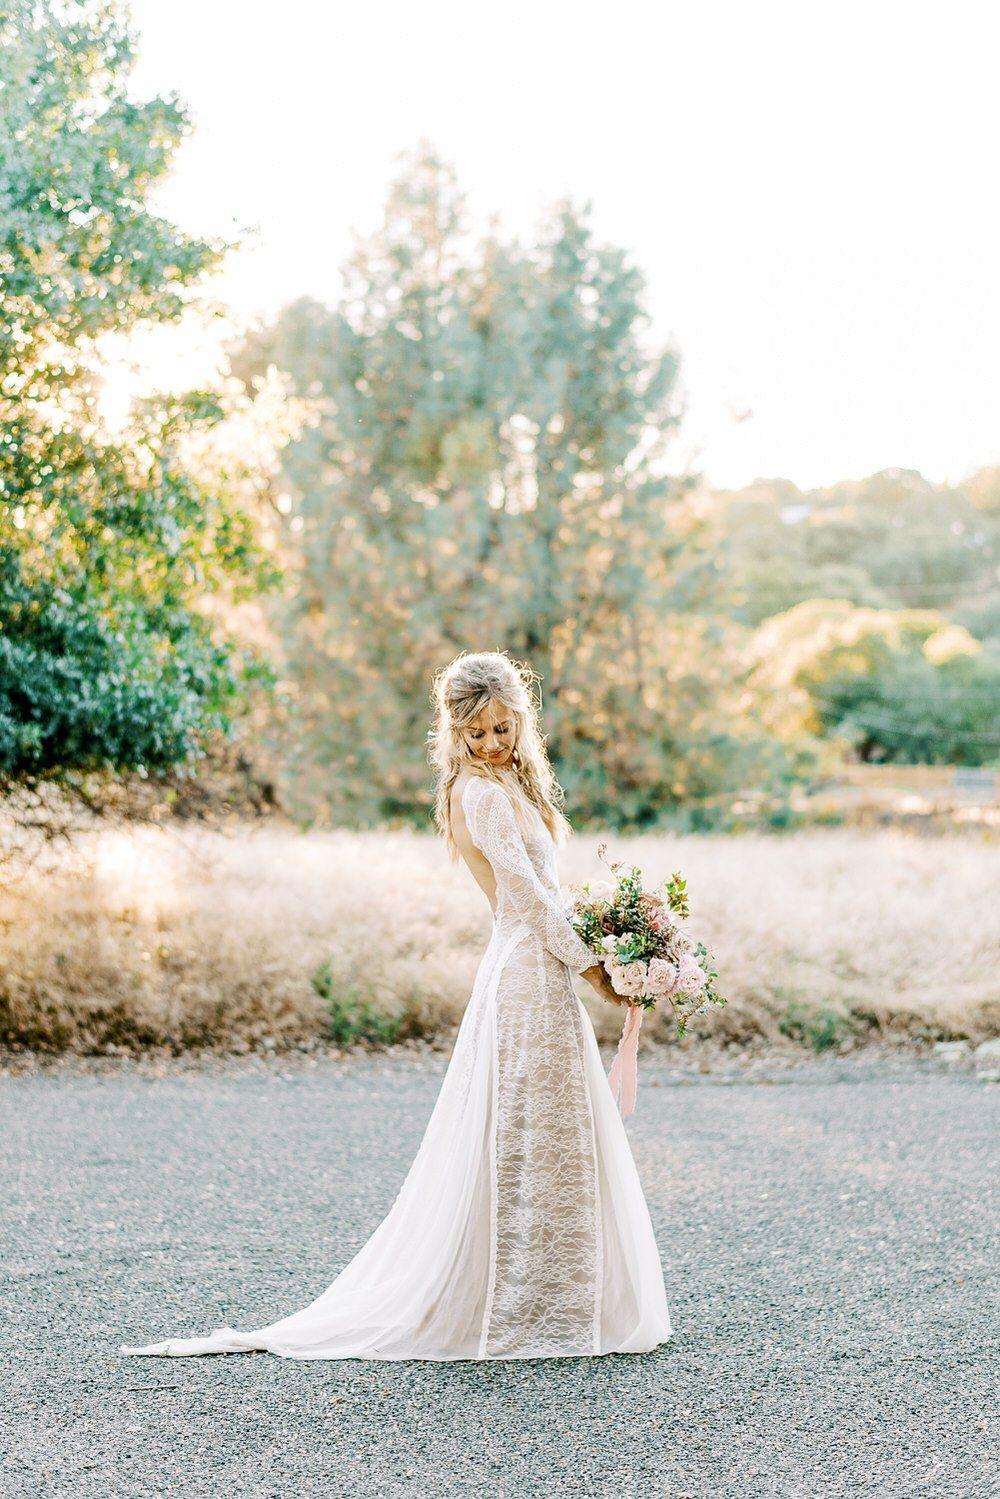 This Backyard Wedding In California Is Why We Love Chic Black Details Ruffled Backyard Wedding Wedding Dresses Simple Whimsical Wedding Gown [ 1499 x 1000 Pixel ]